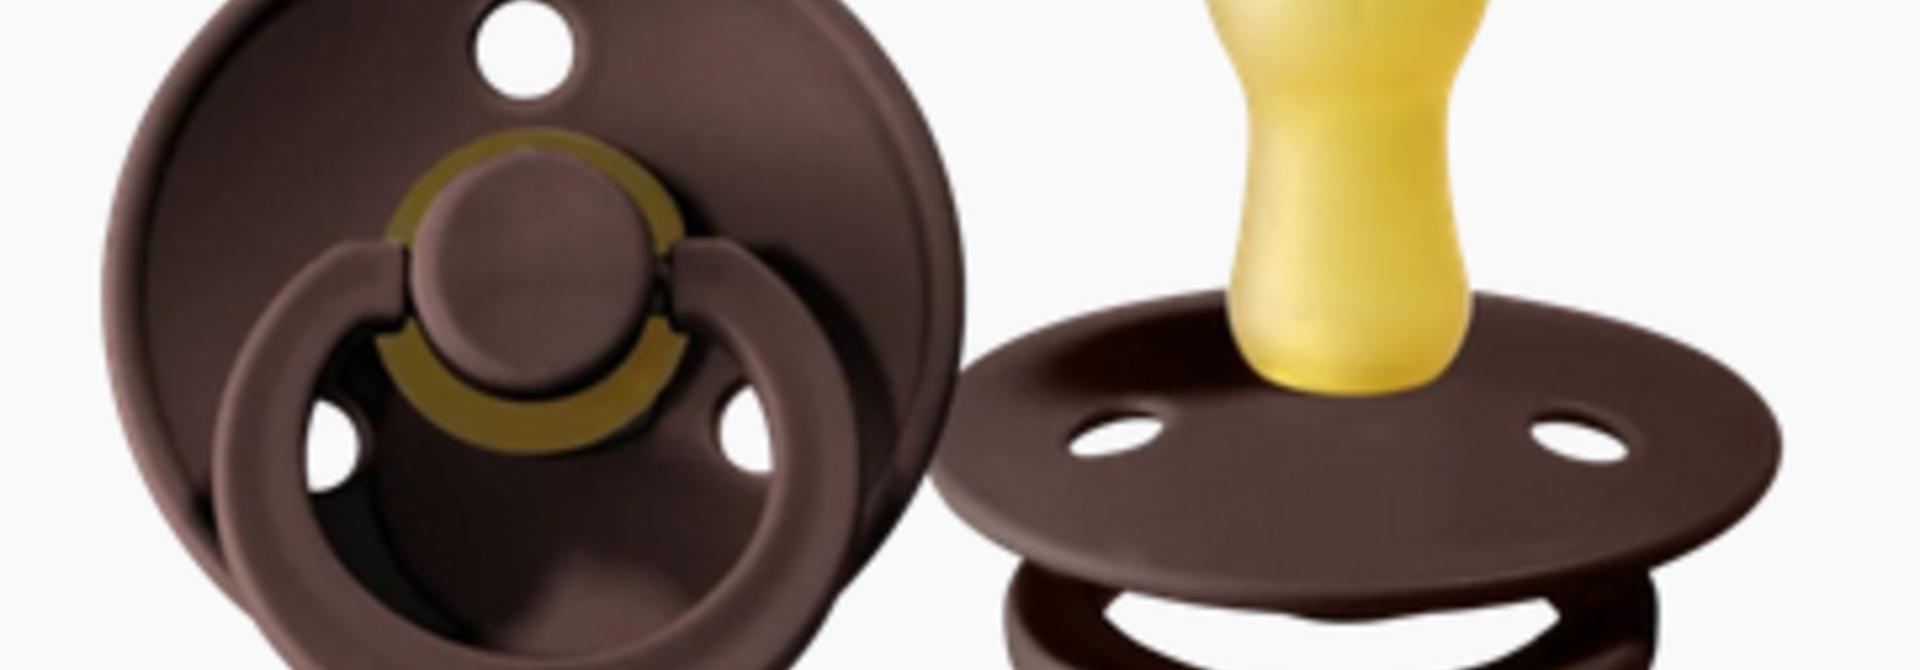 Suce Bibs - Chestnut